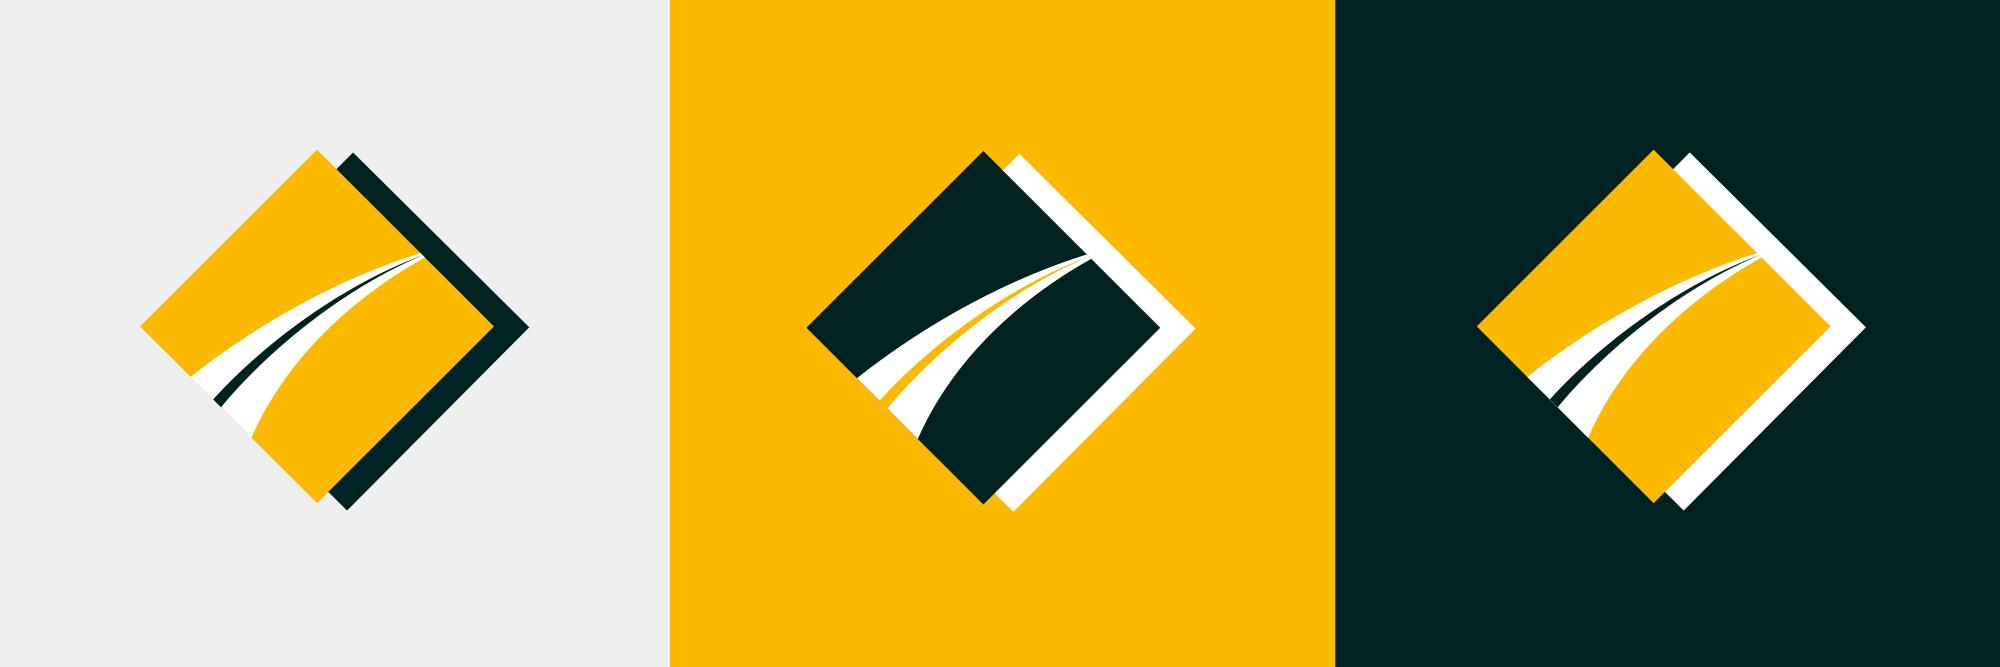 ikadia-portfolio-gamba-1